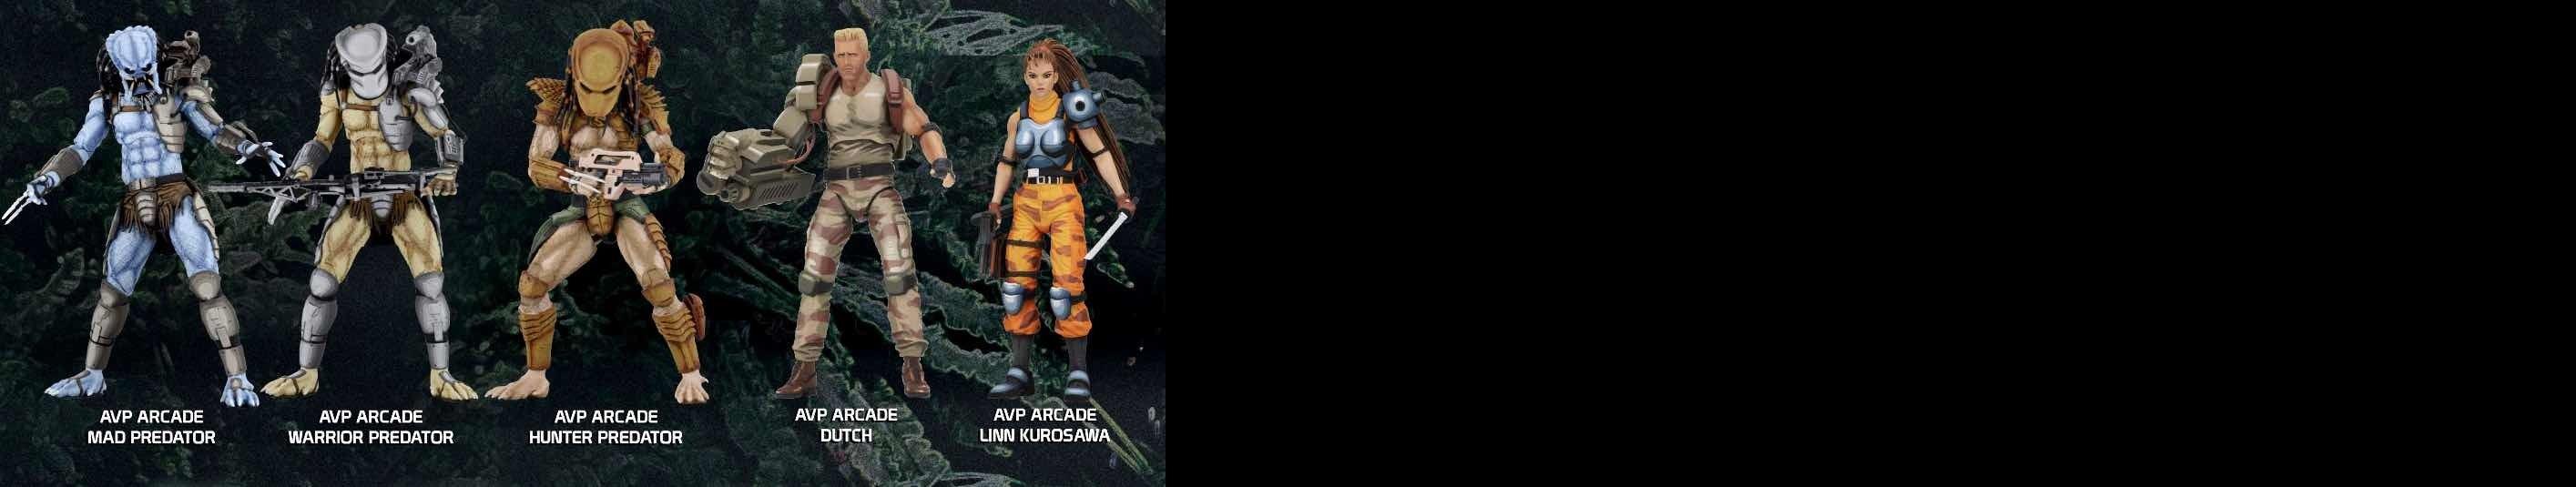 Neca Toys Teases Crash Bandicoot Alien Vs Predator Arcade Figures